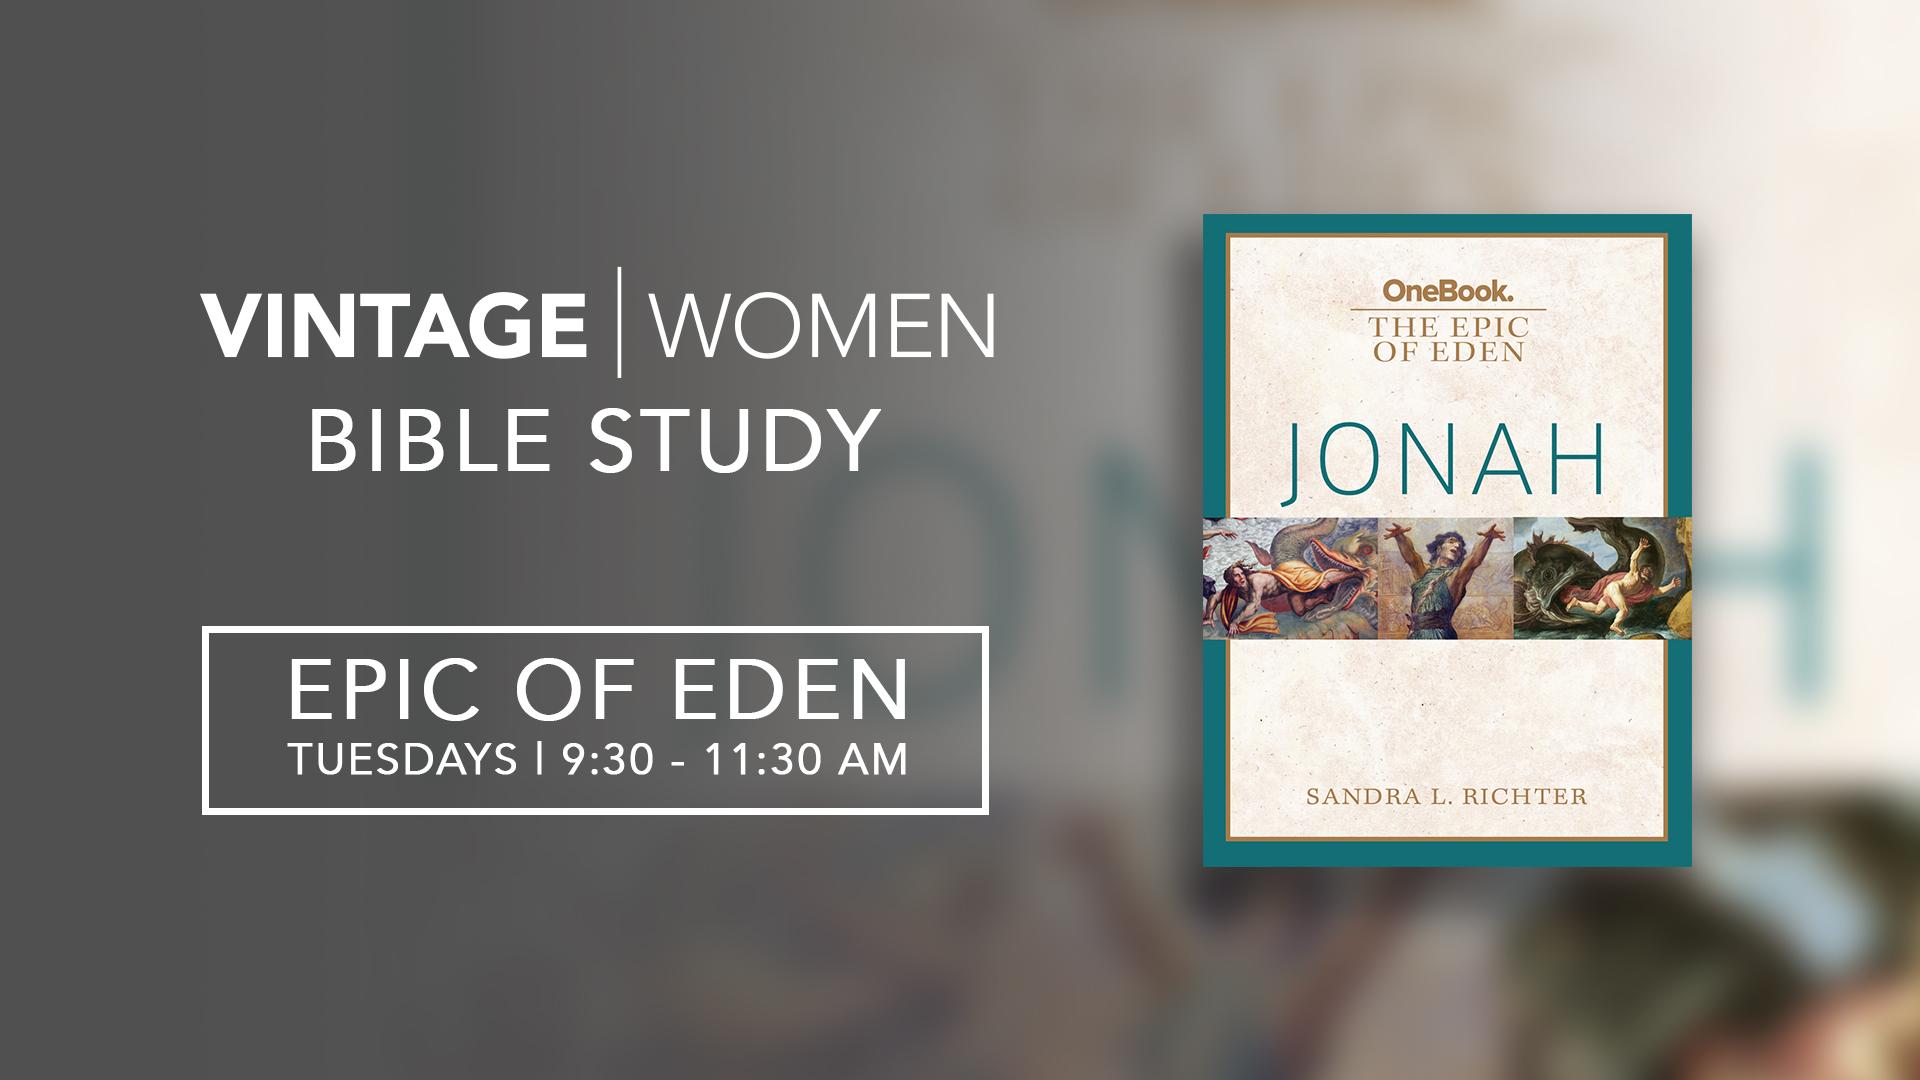 BibleStudy_EpicofEden_Jonah.jpg